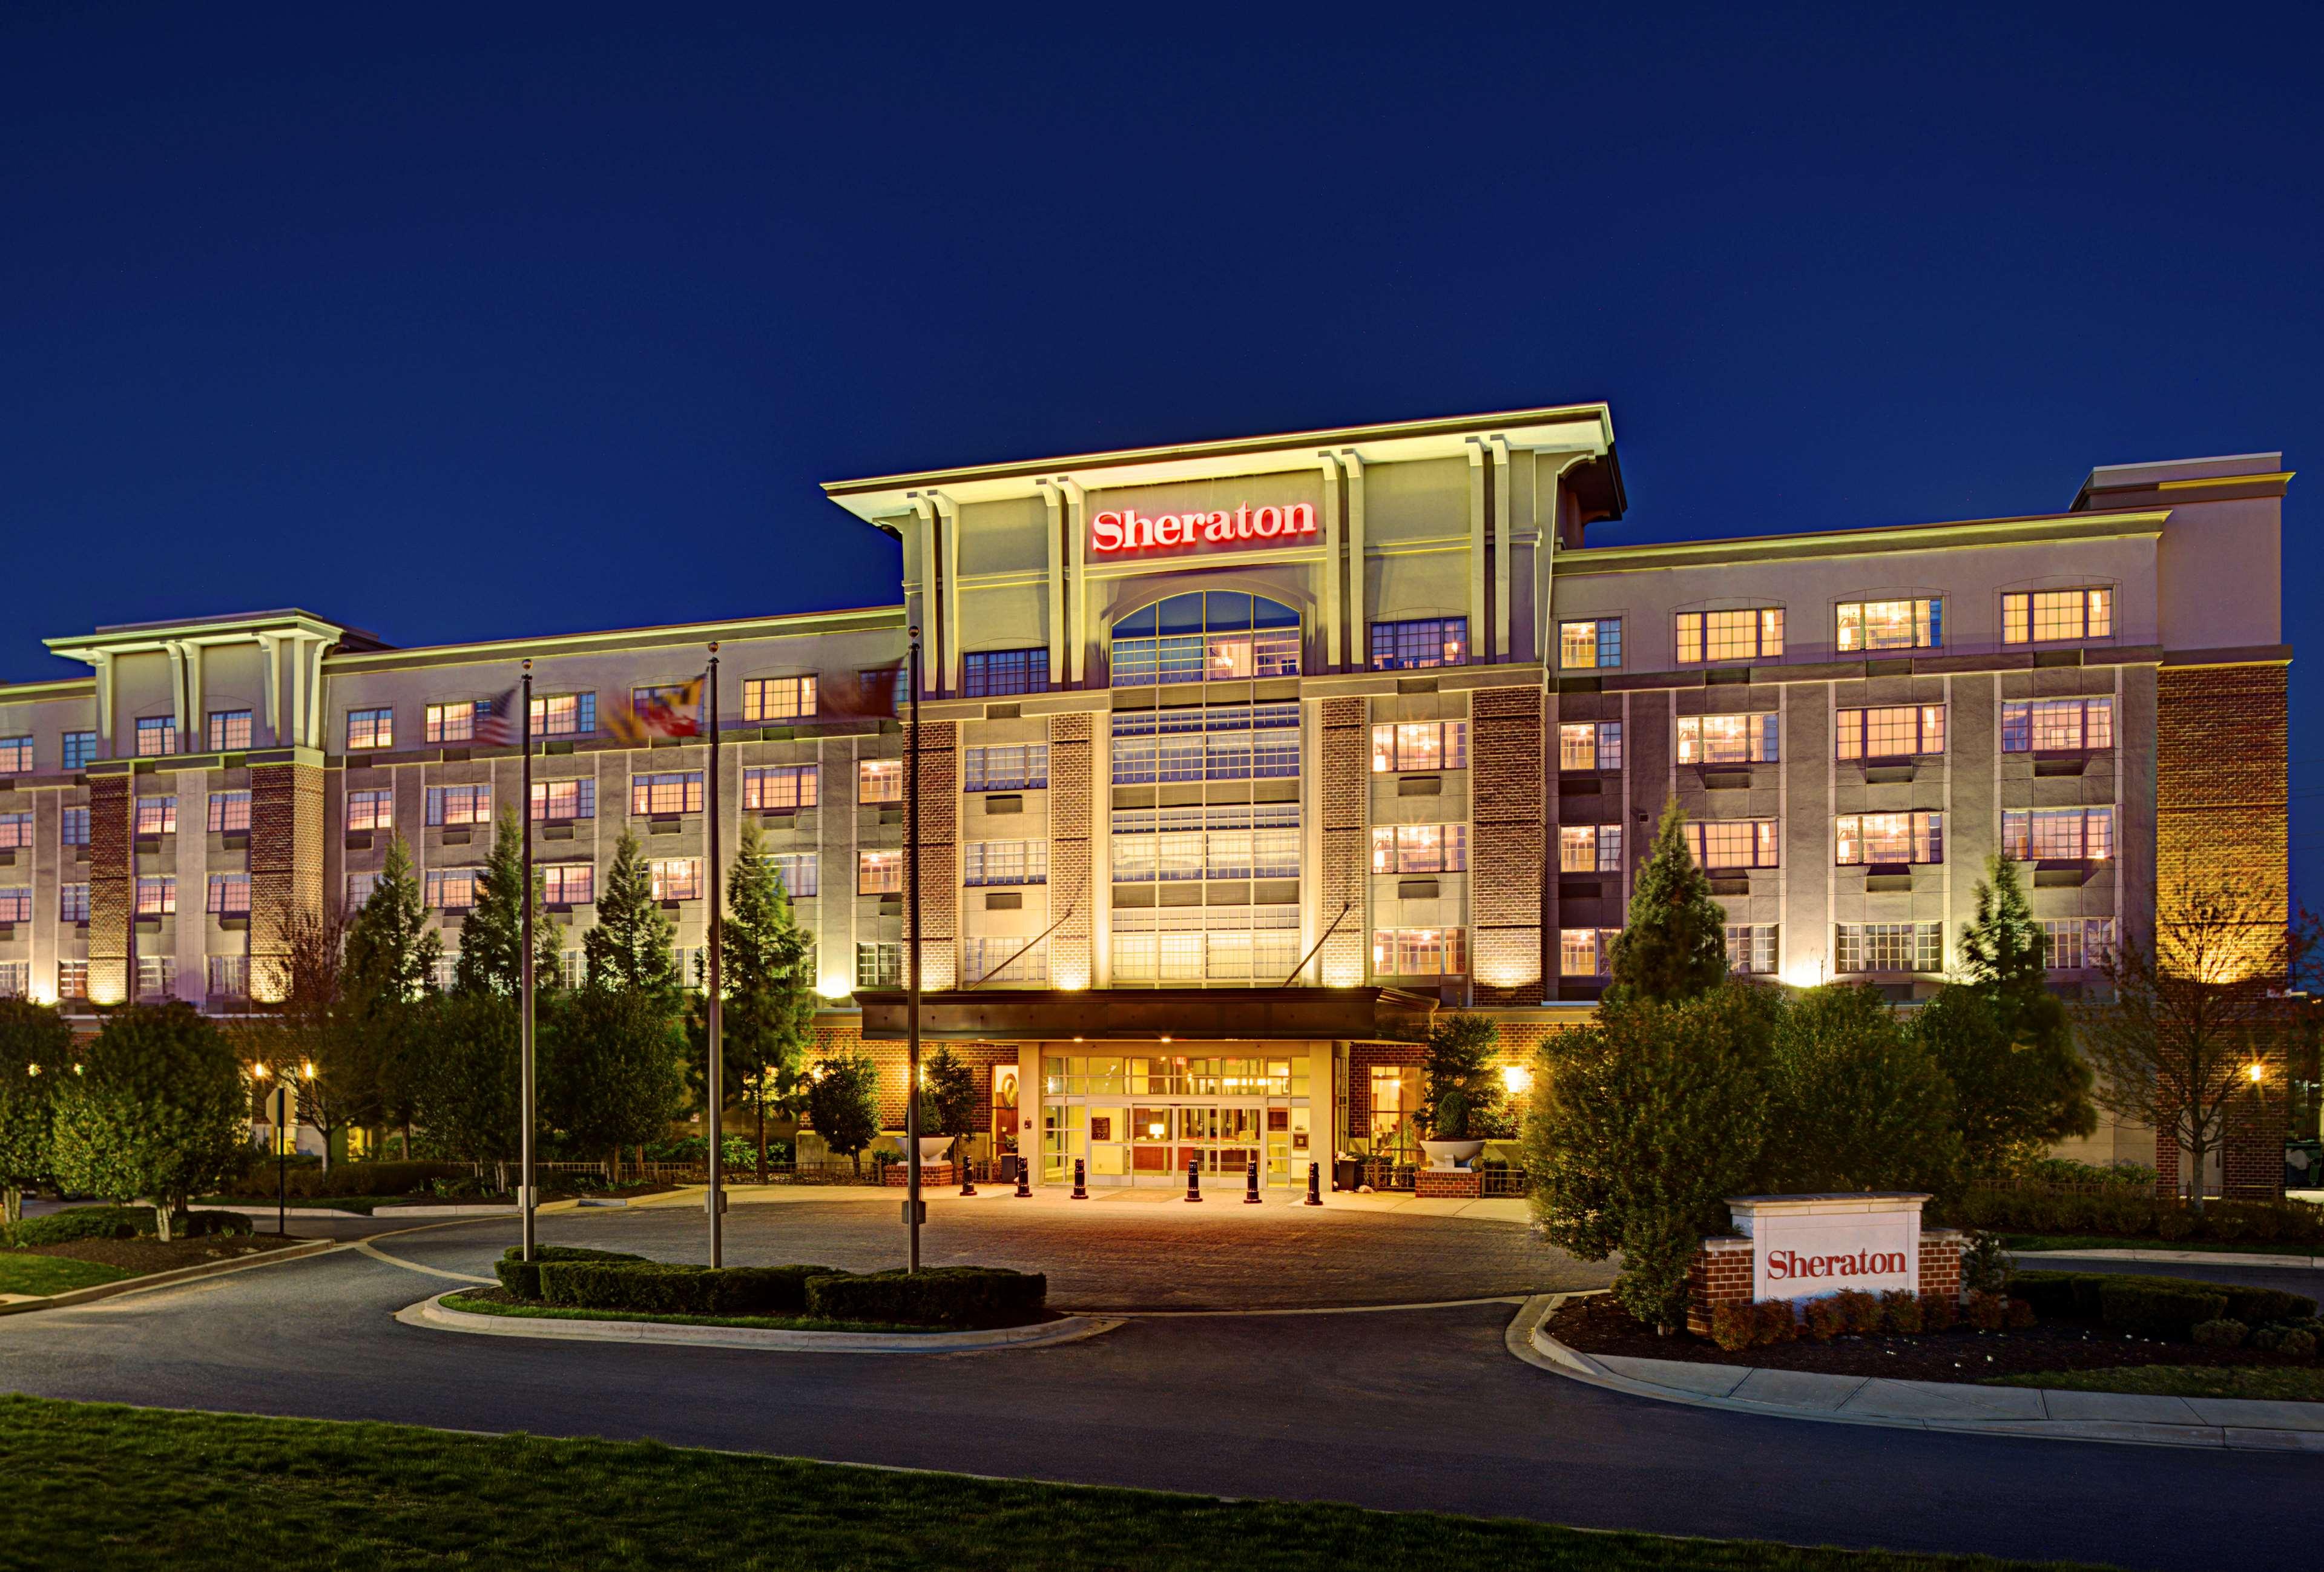 Sheraton Rockville Hotel image 8